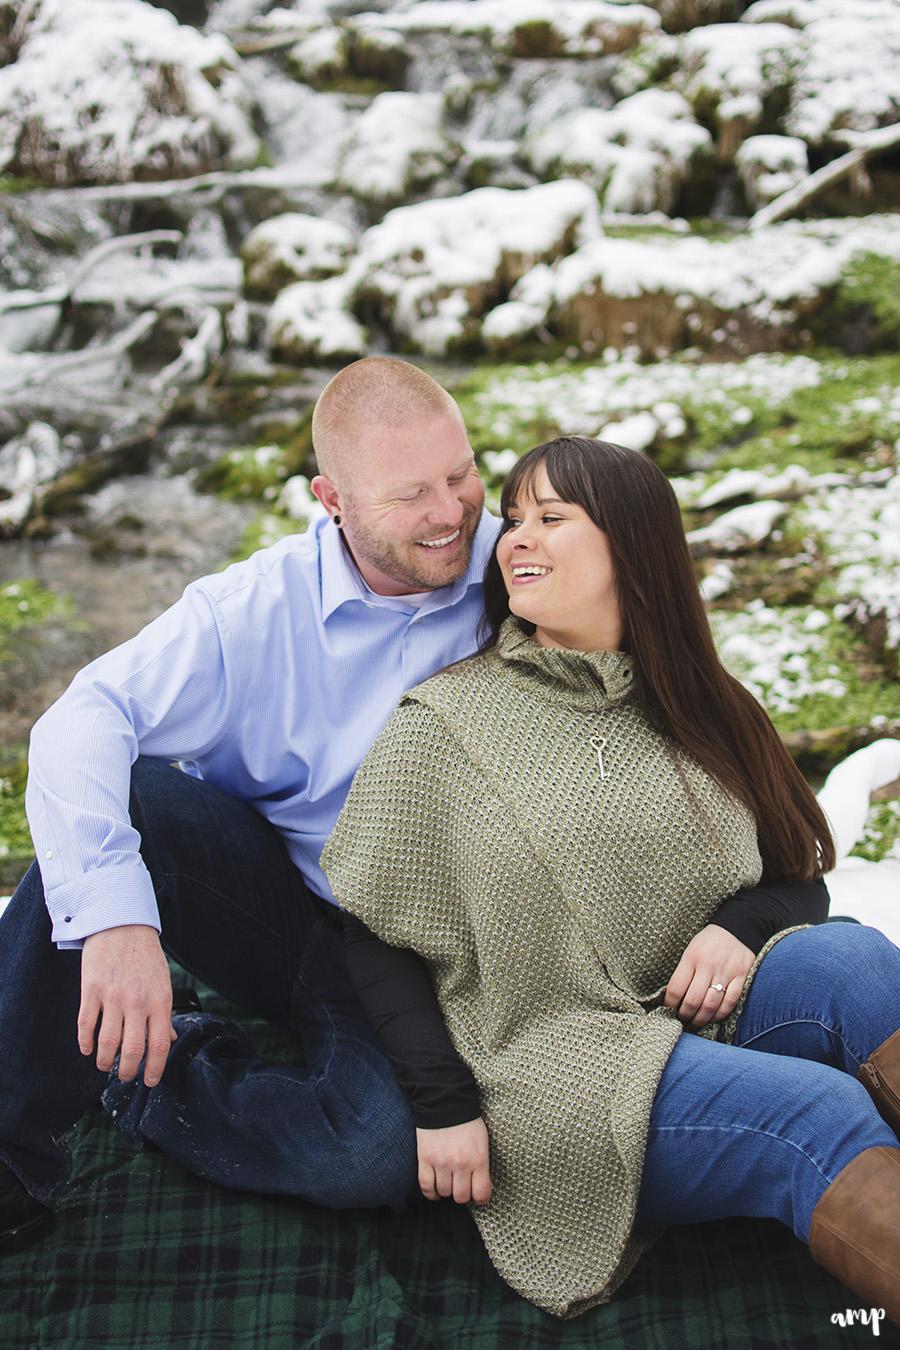 Rifle Fall Cascades Engagement Photographer | amanda.matilda.photography